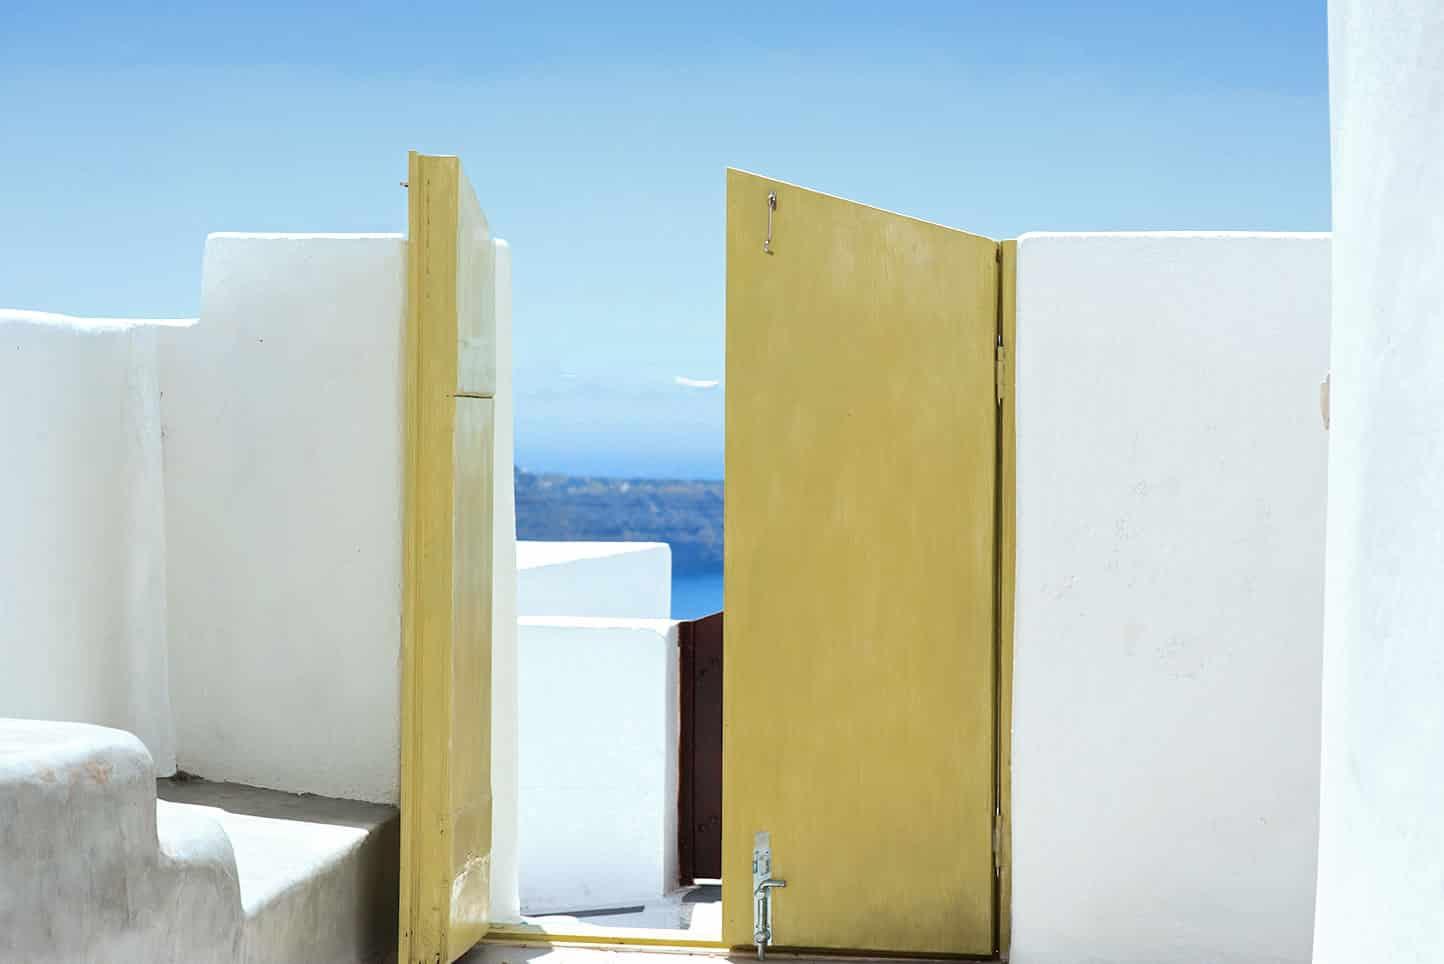 luxury suites jacuzzi santorini caldera view bluedolphins